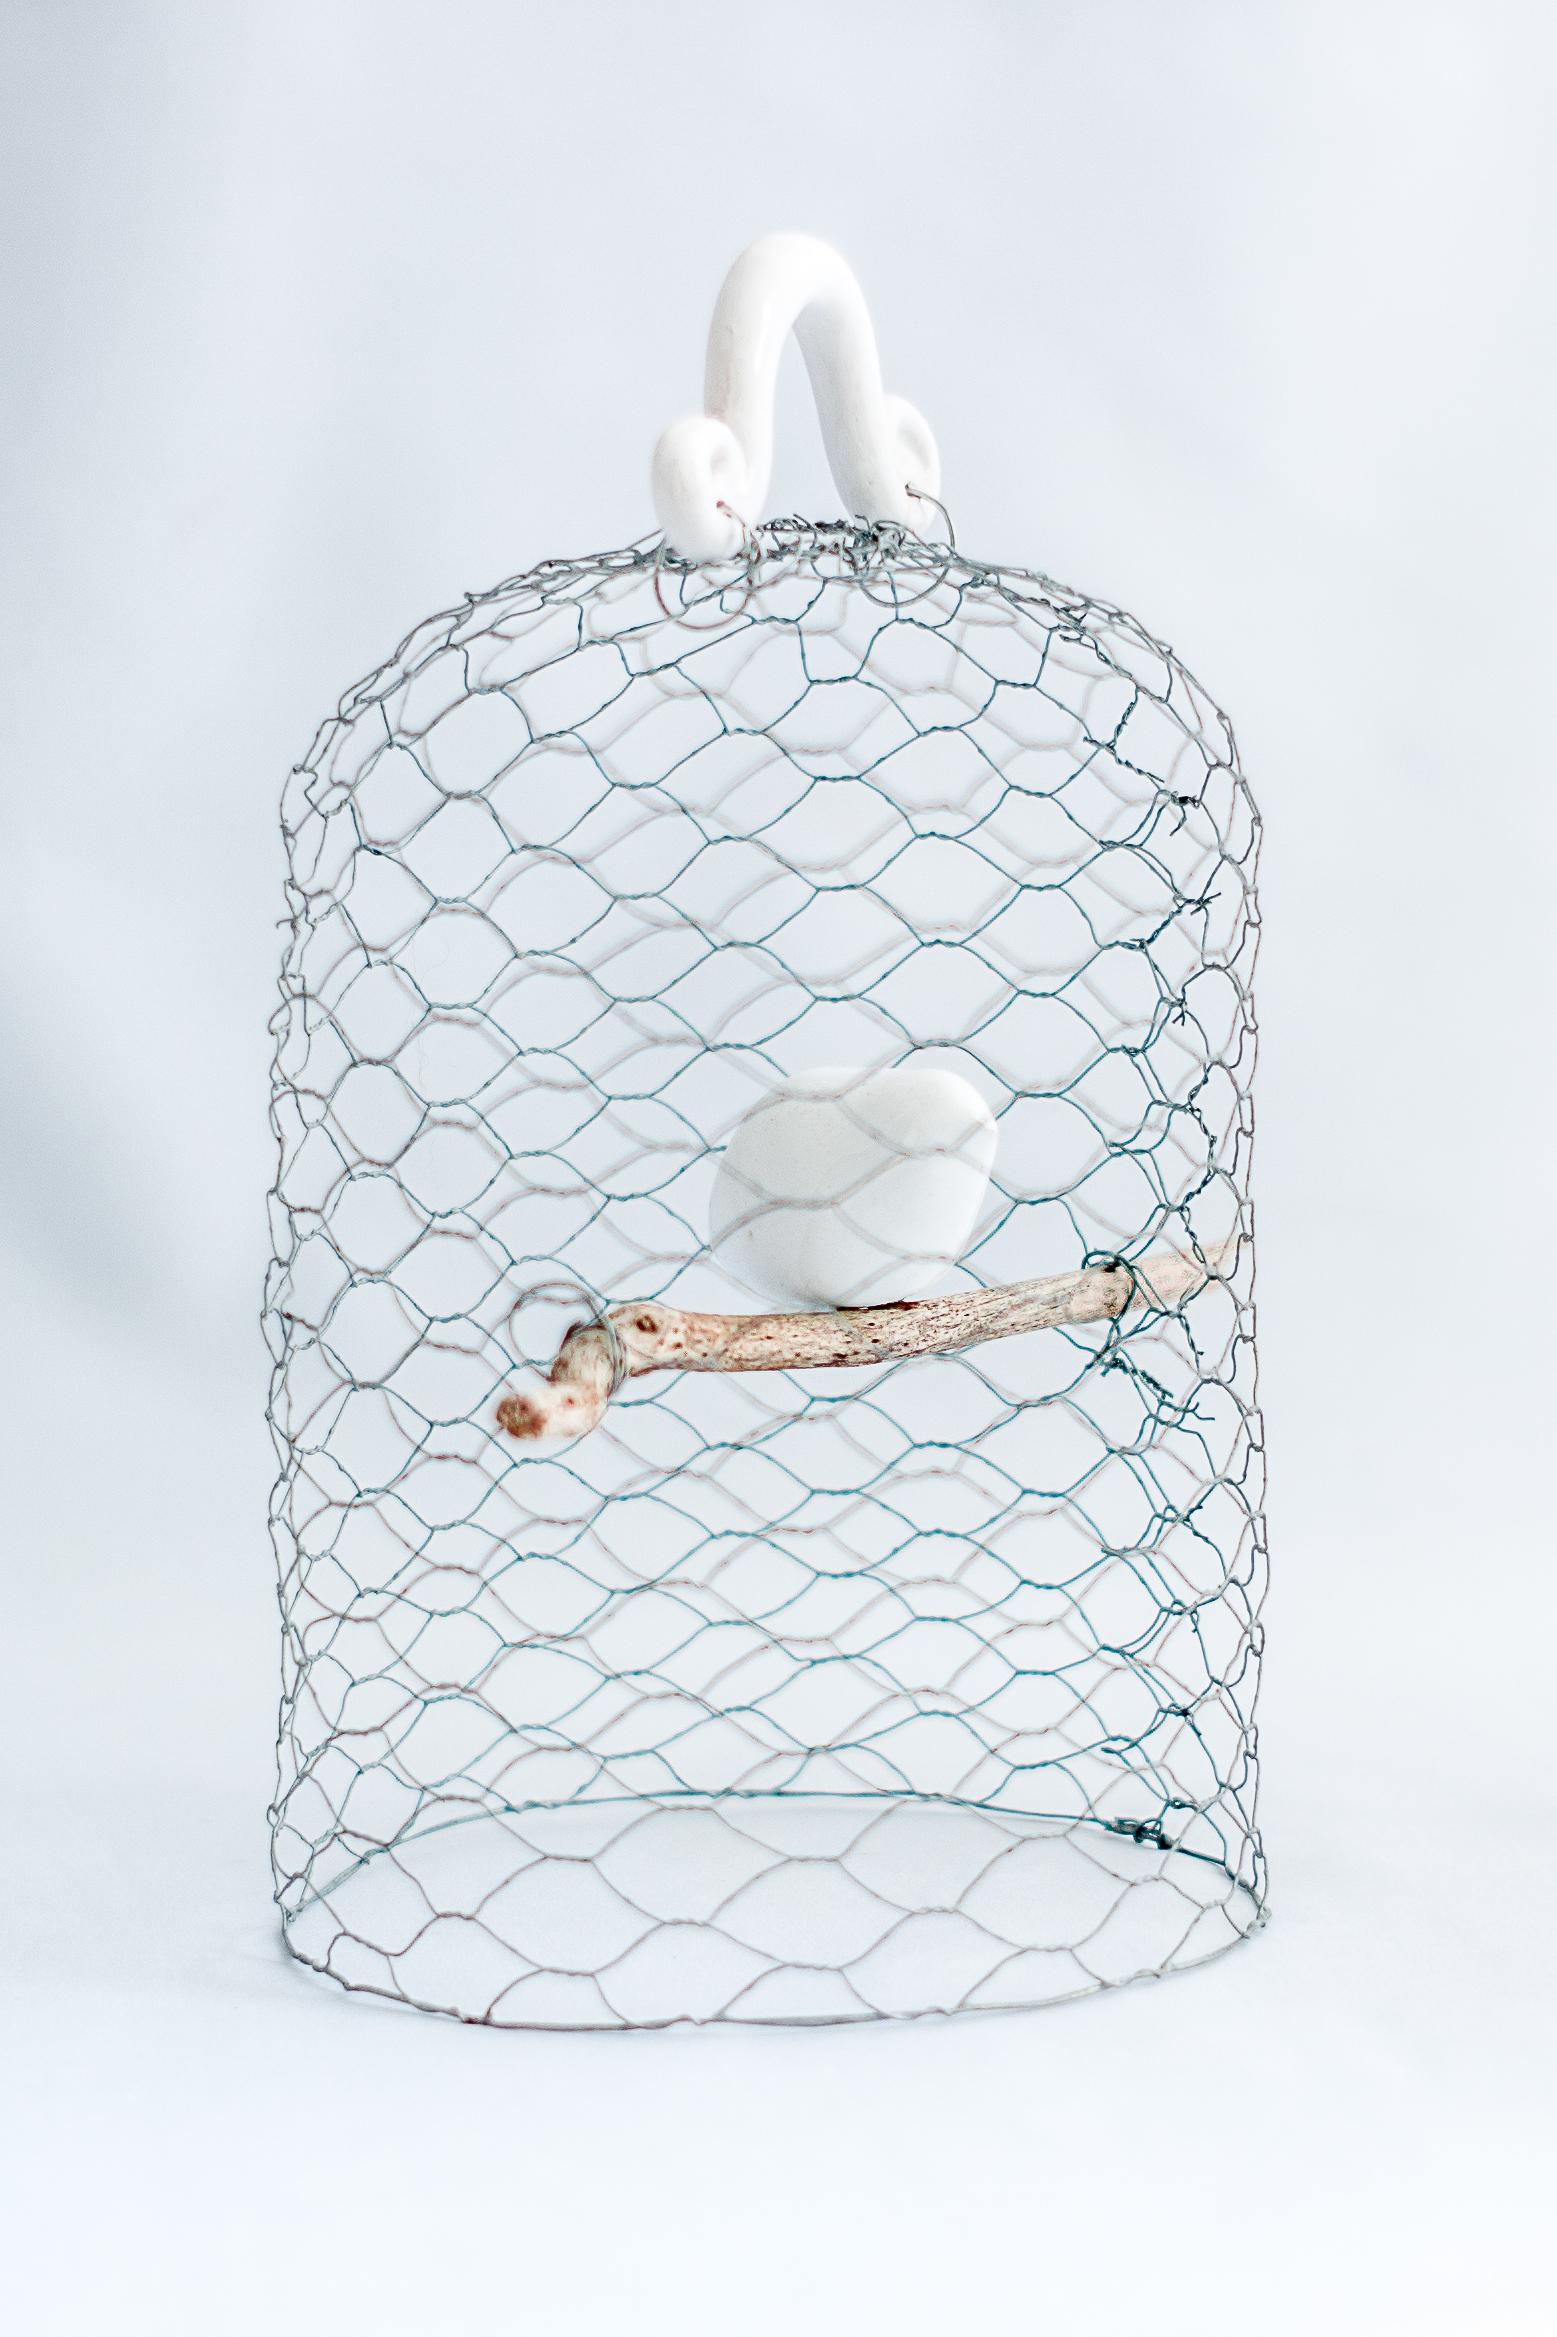 cage a l'oiseau (1 of 1)